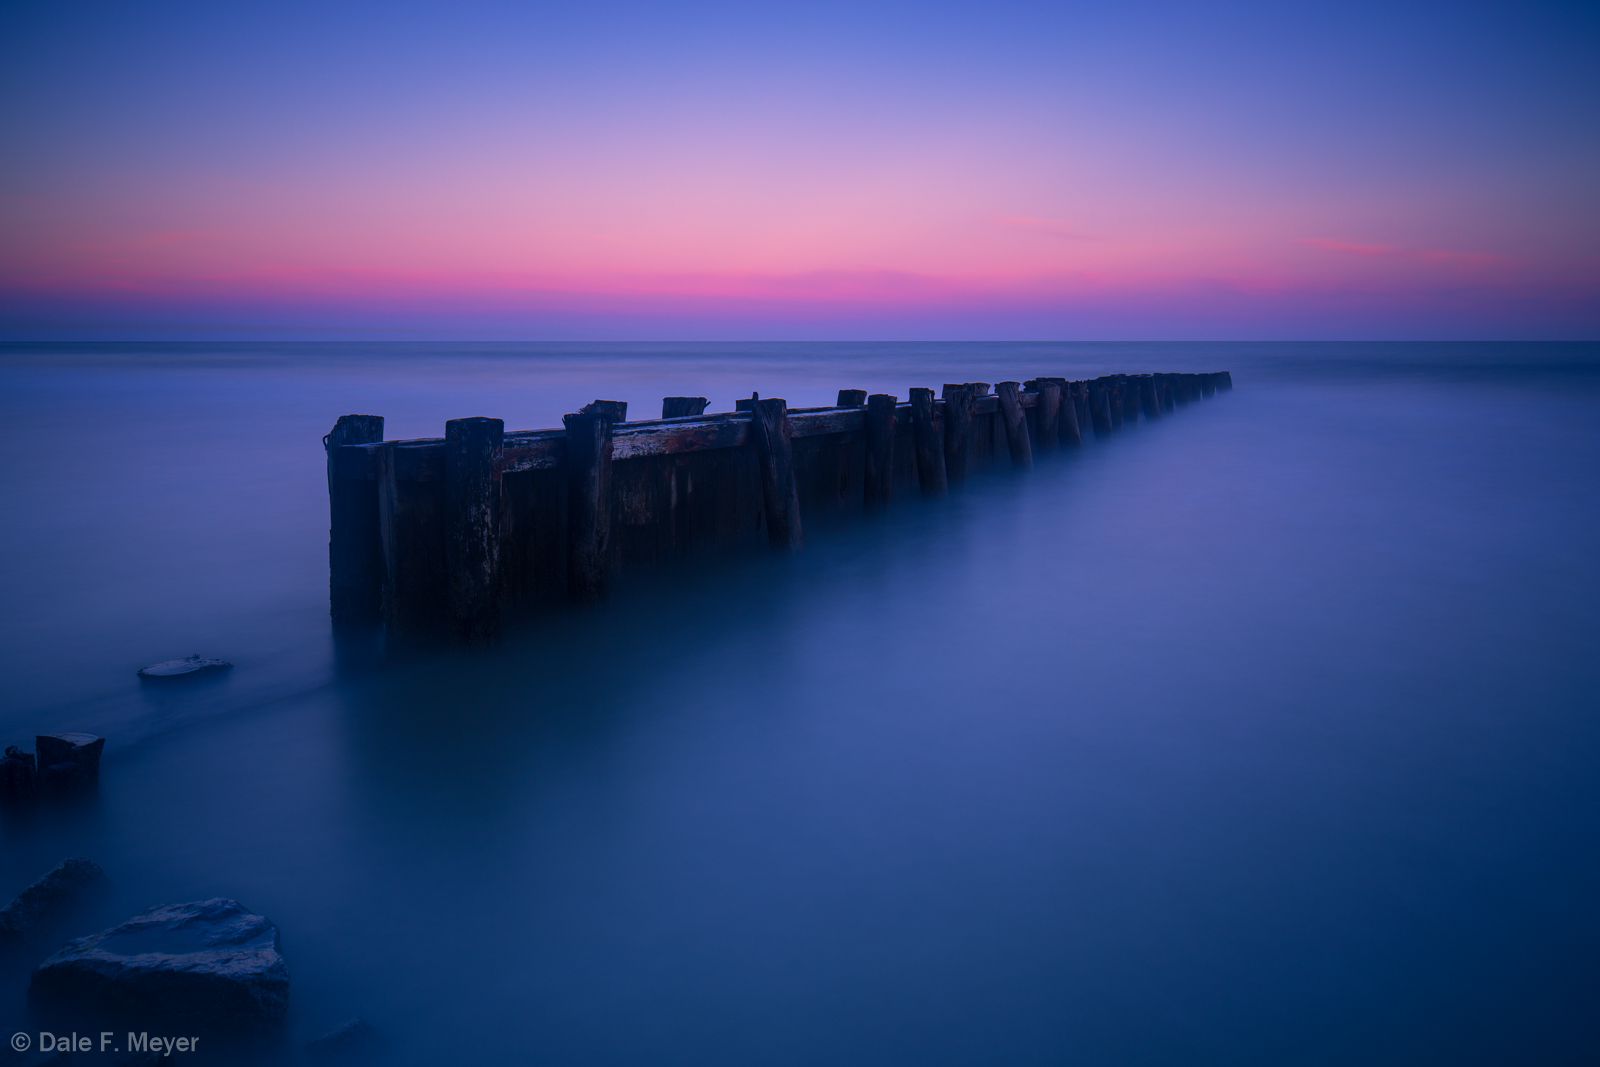 Costal,Pier,long exposure,sunset